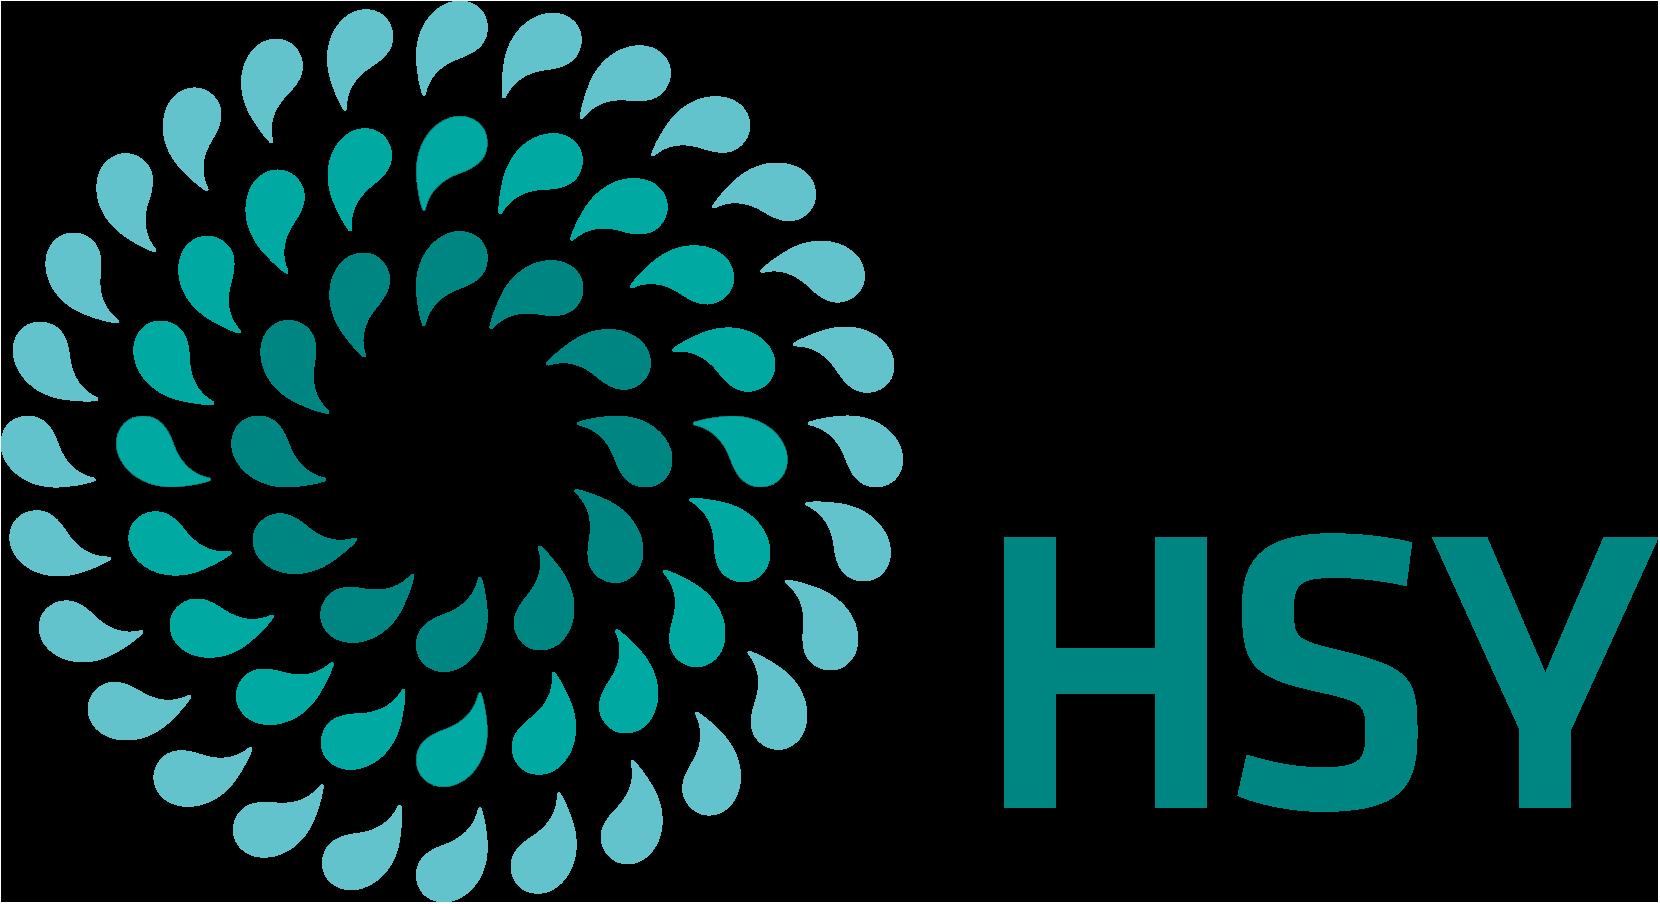 Helsingin seudun ympäristöpalvelut -kuntayhtymä HSY logo